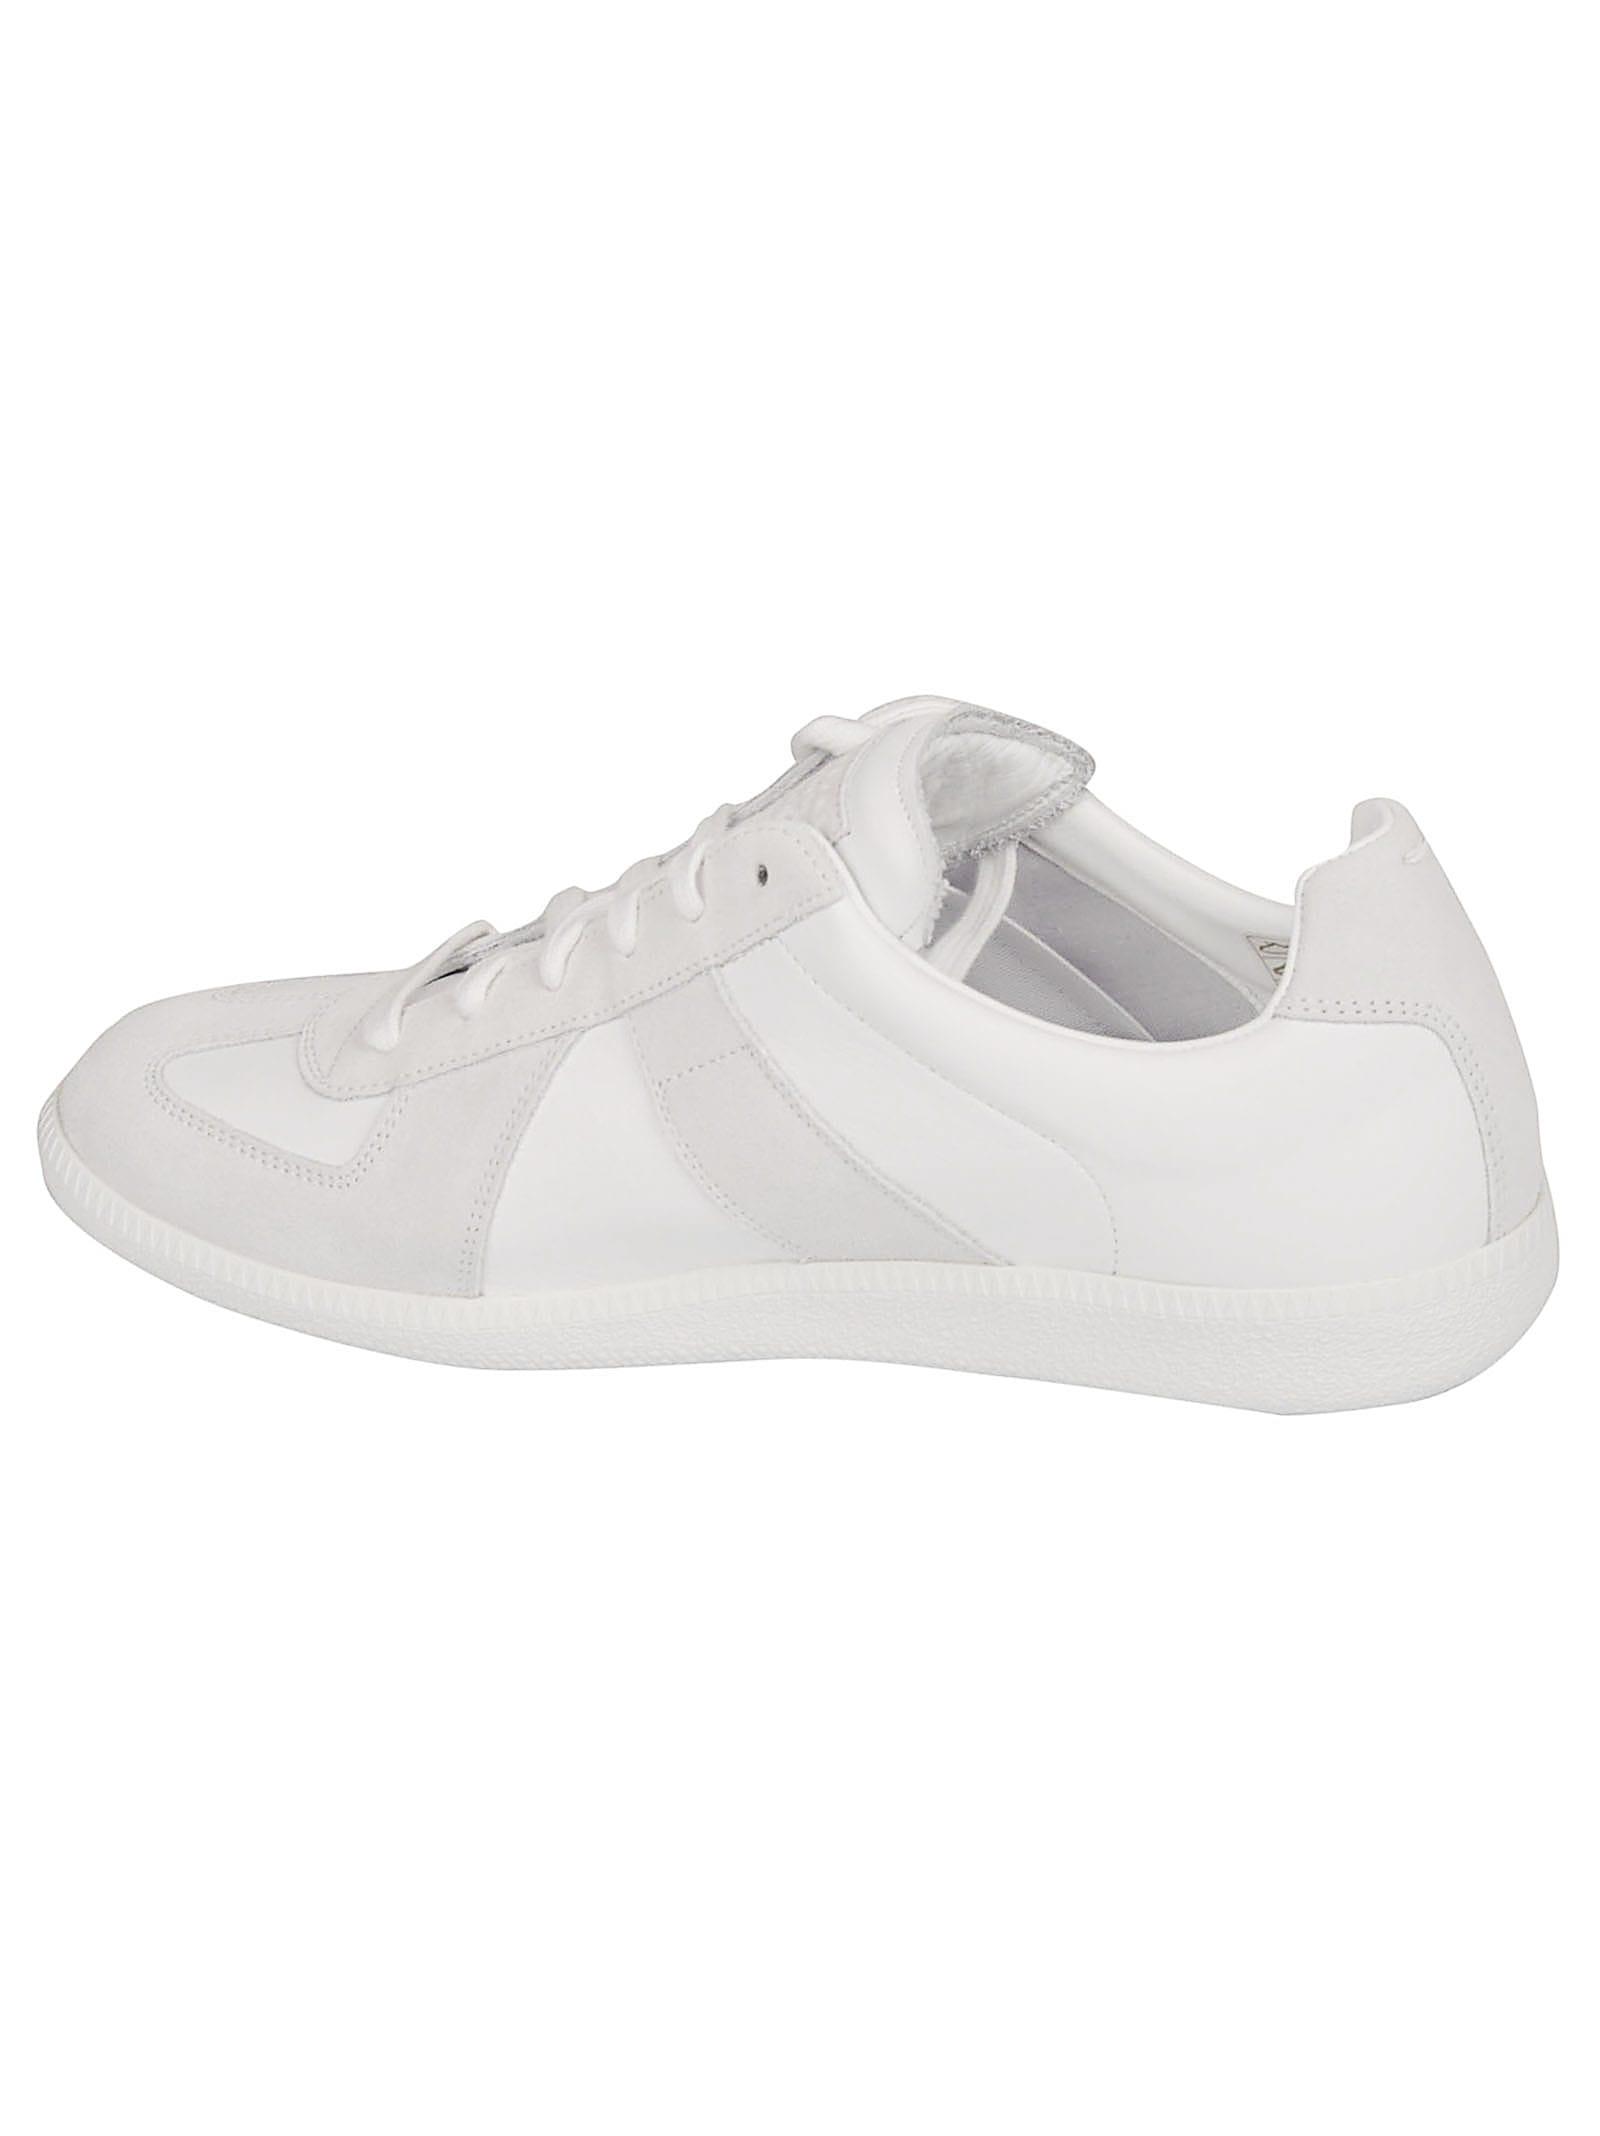 be1fde9a4a2 Maison Margiela Replica Sneakers